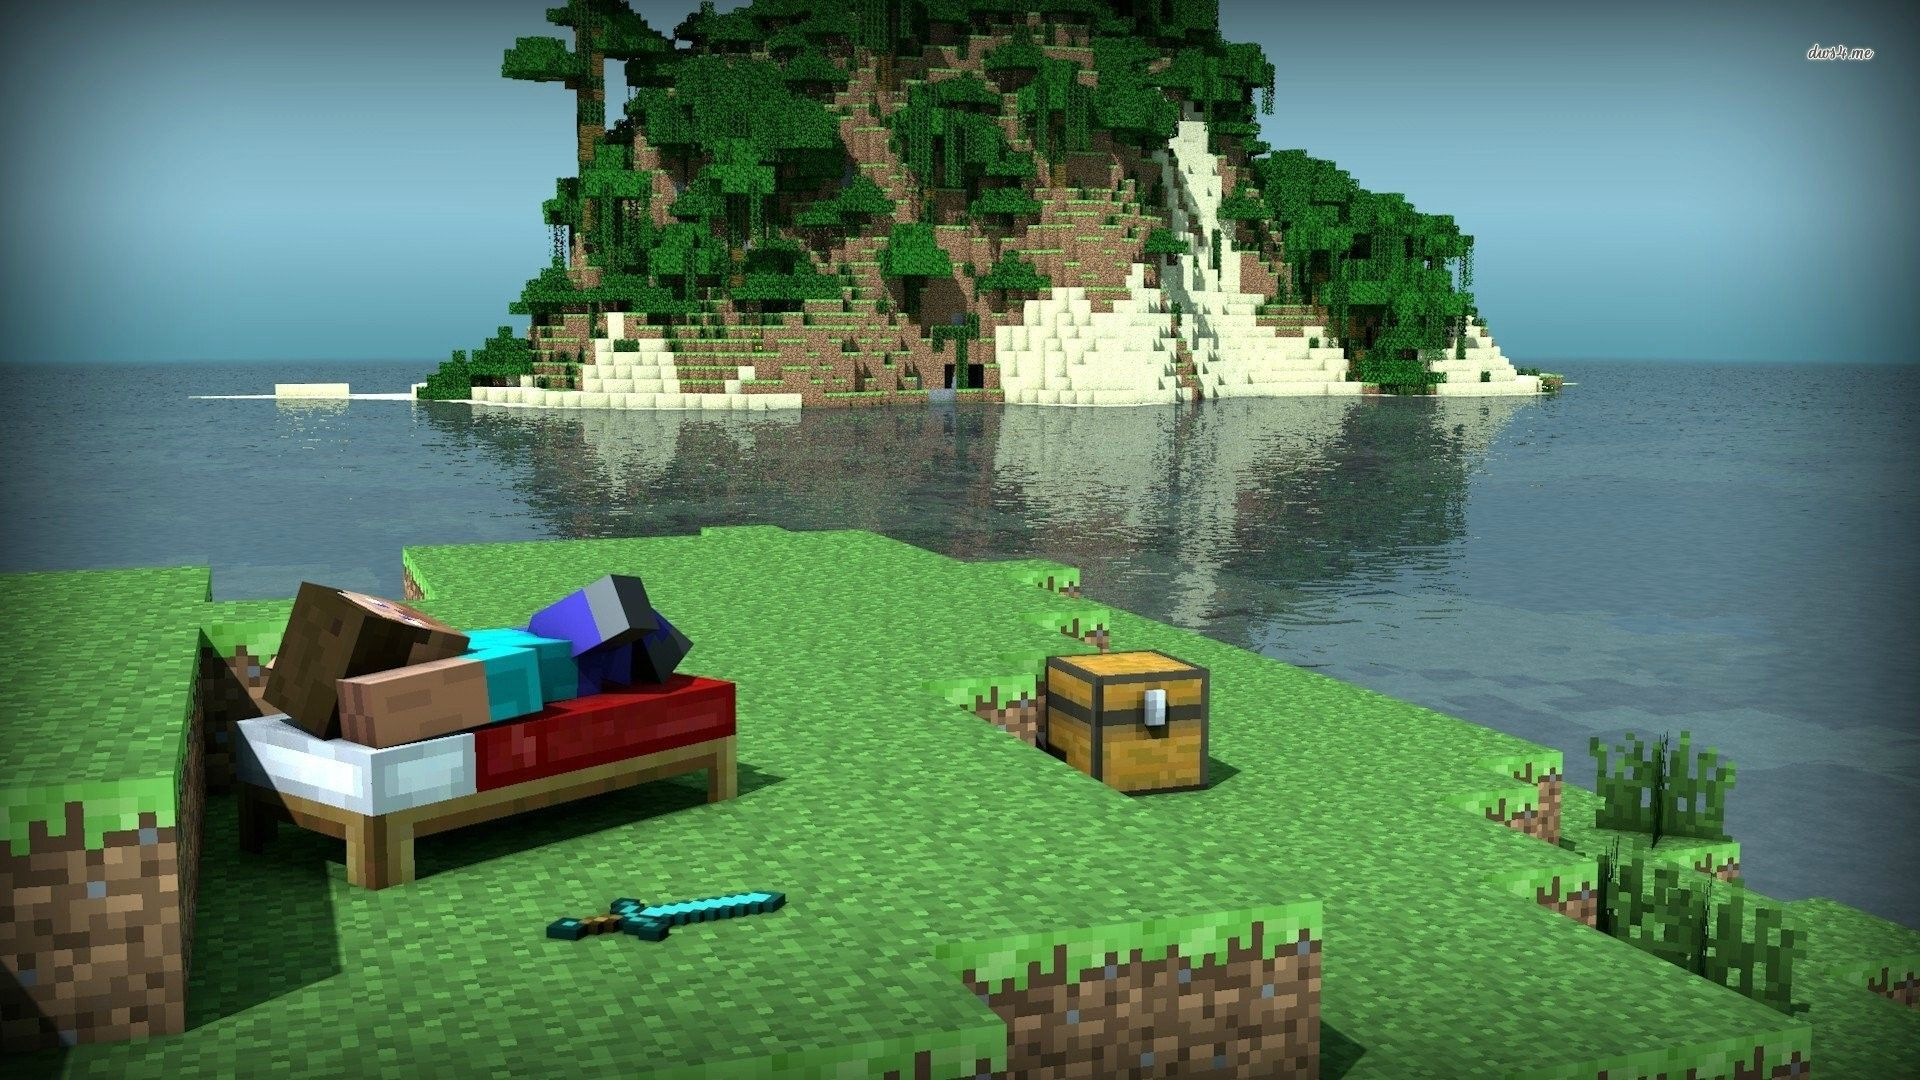 Amazing Wallpaper Minecraft Thanksgiving - fcba603603b9a95693e6f49ab3df1c6e  You Should Have_713621.jpg